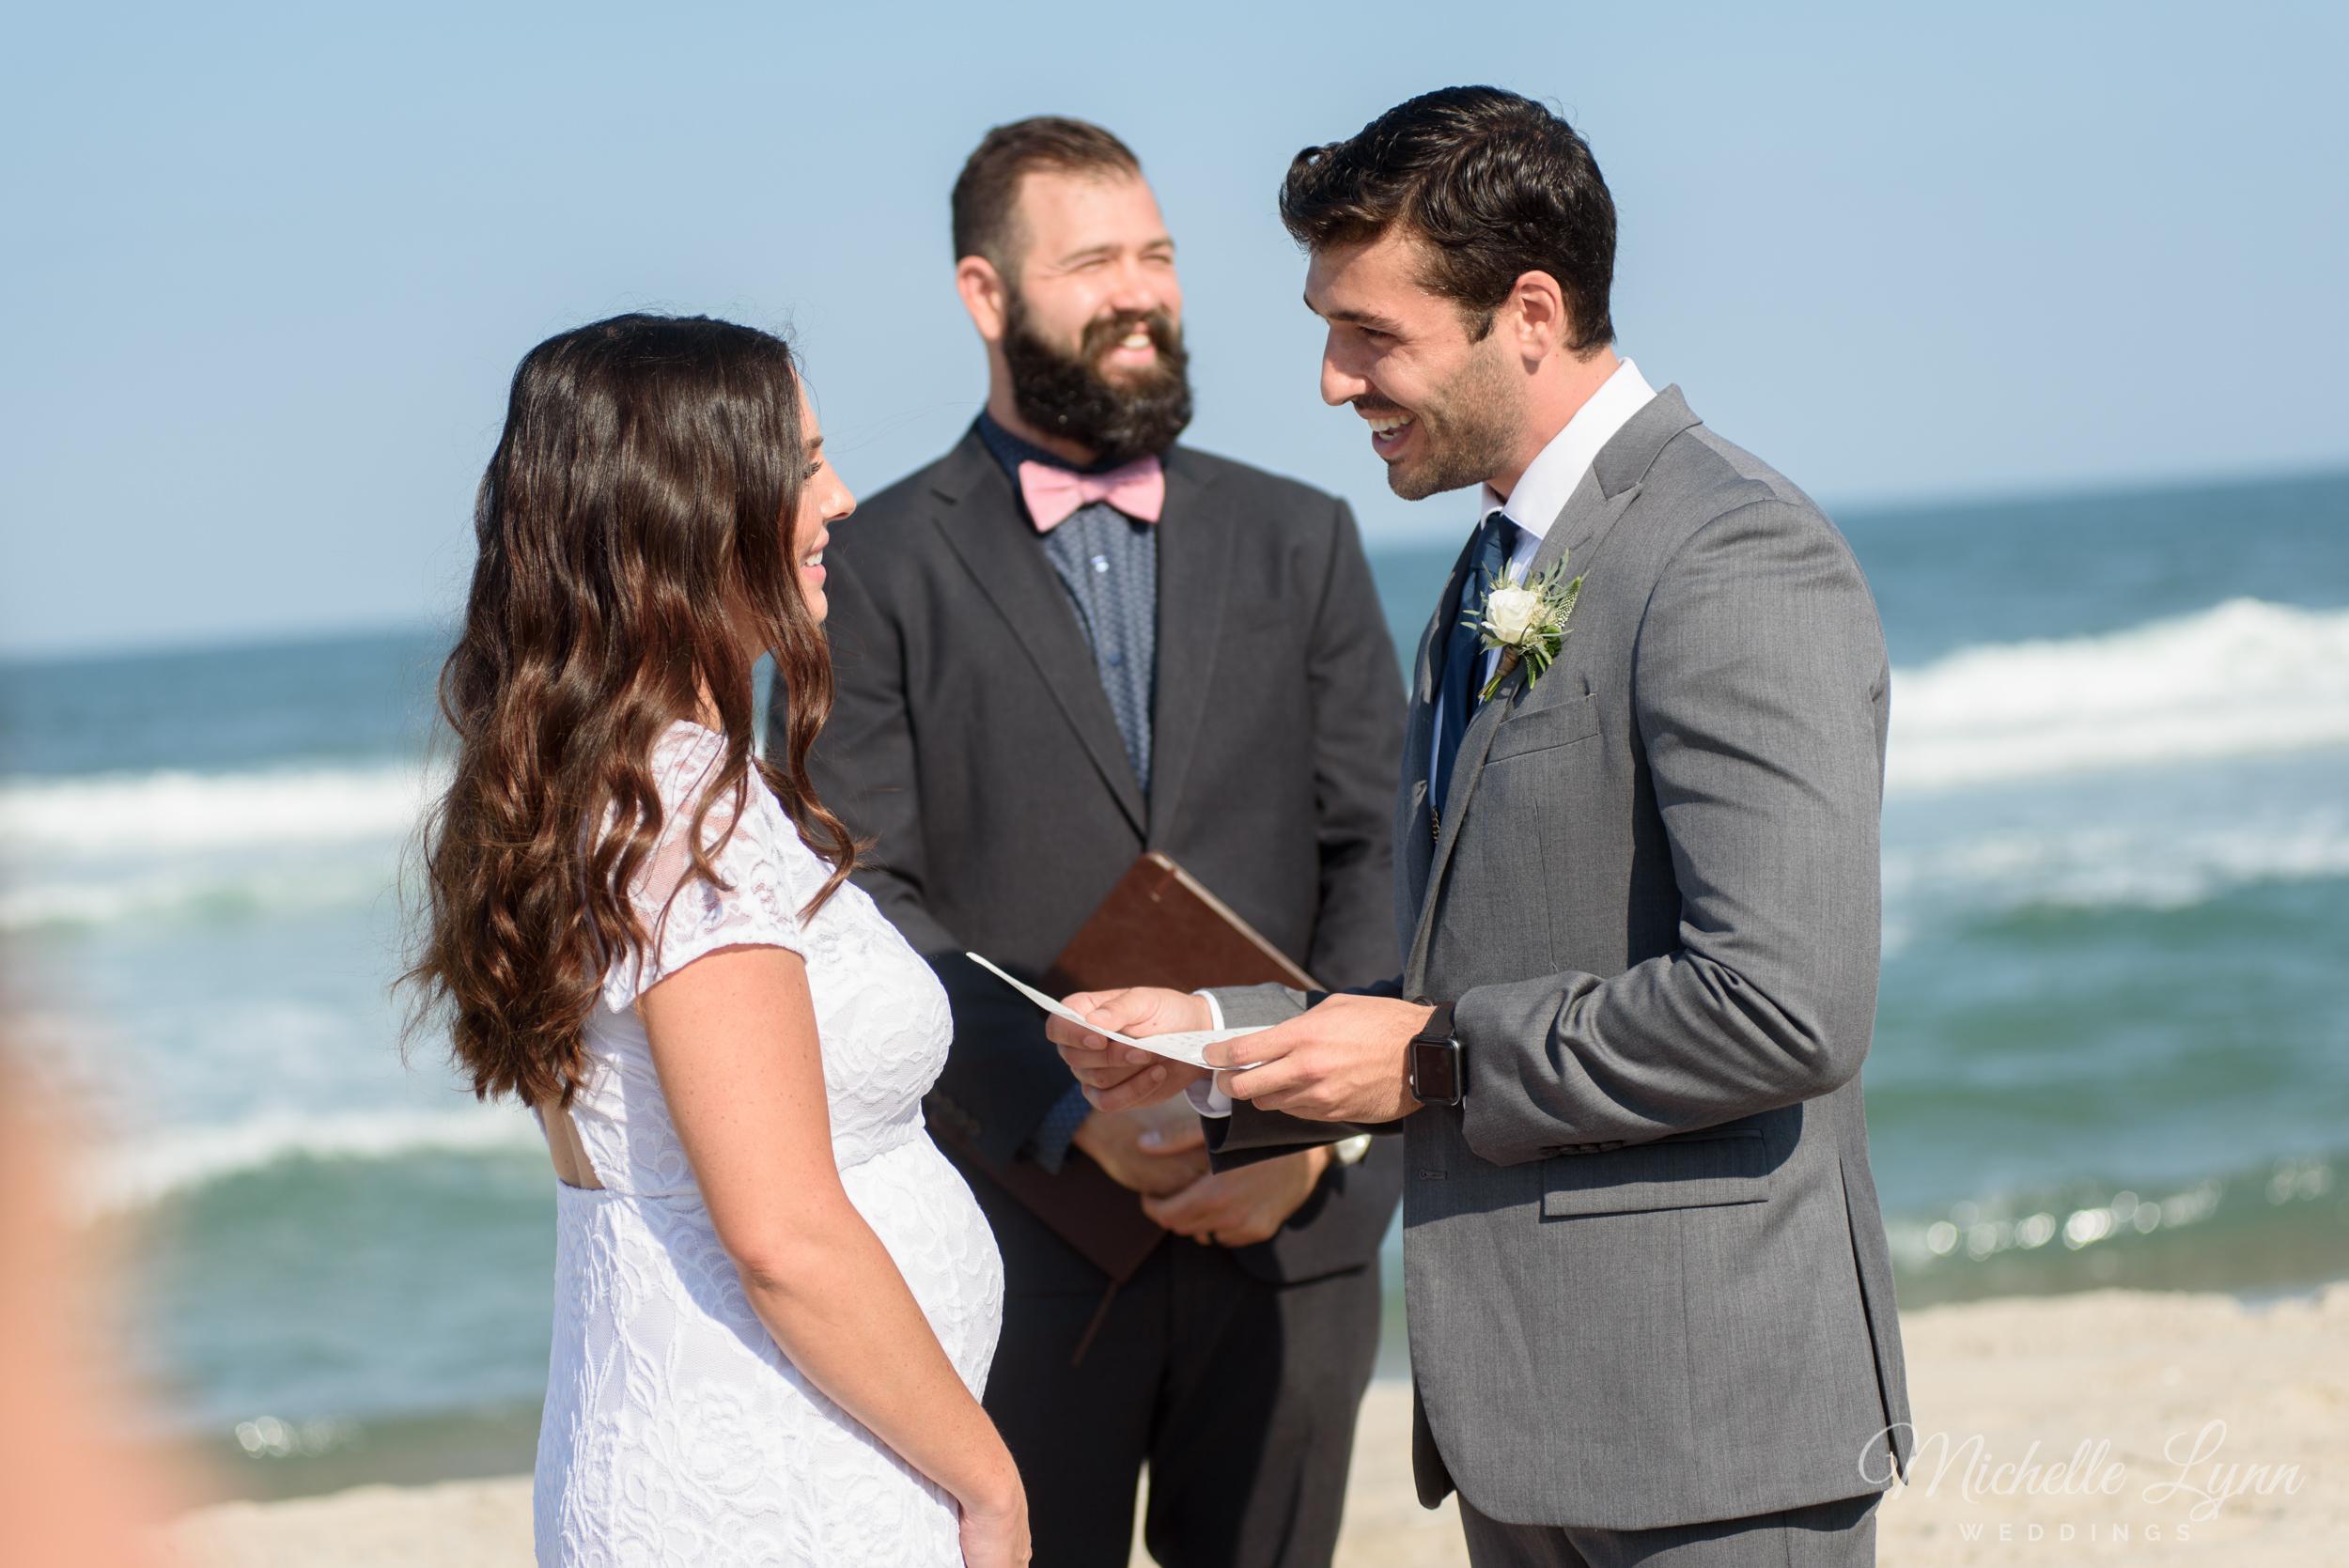 mlw-brant-beach-lbi-wedding-photography-27.jpg